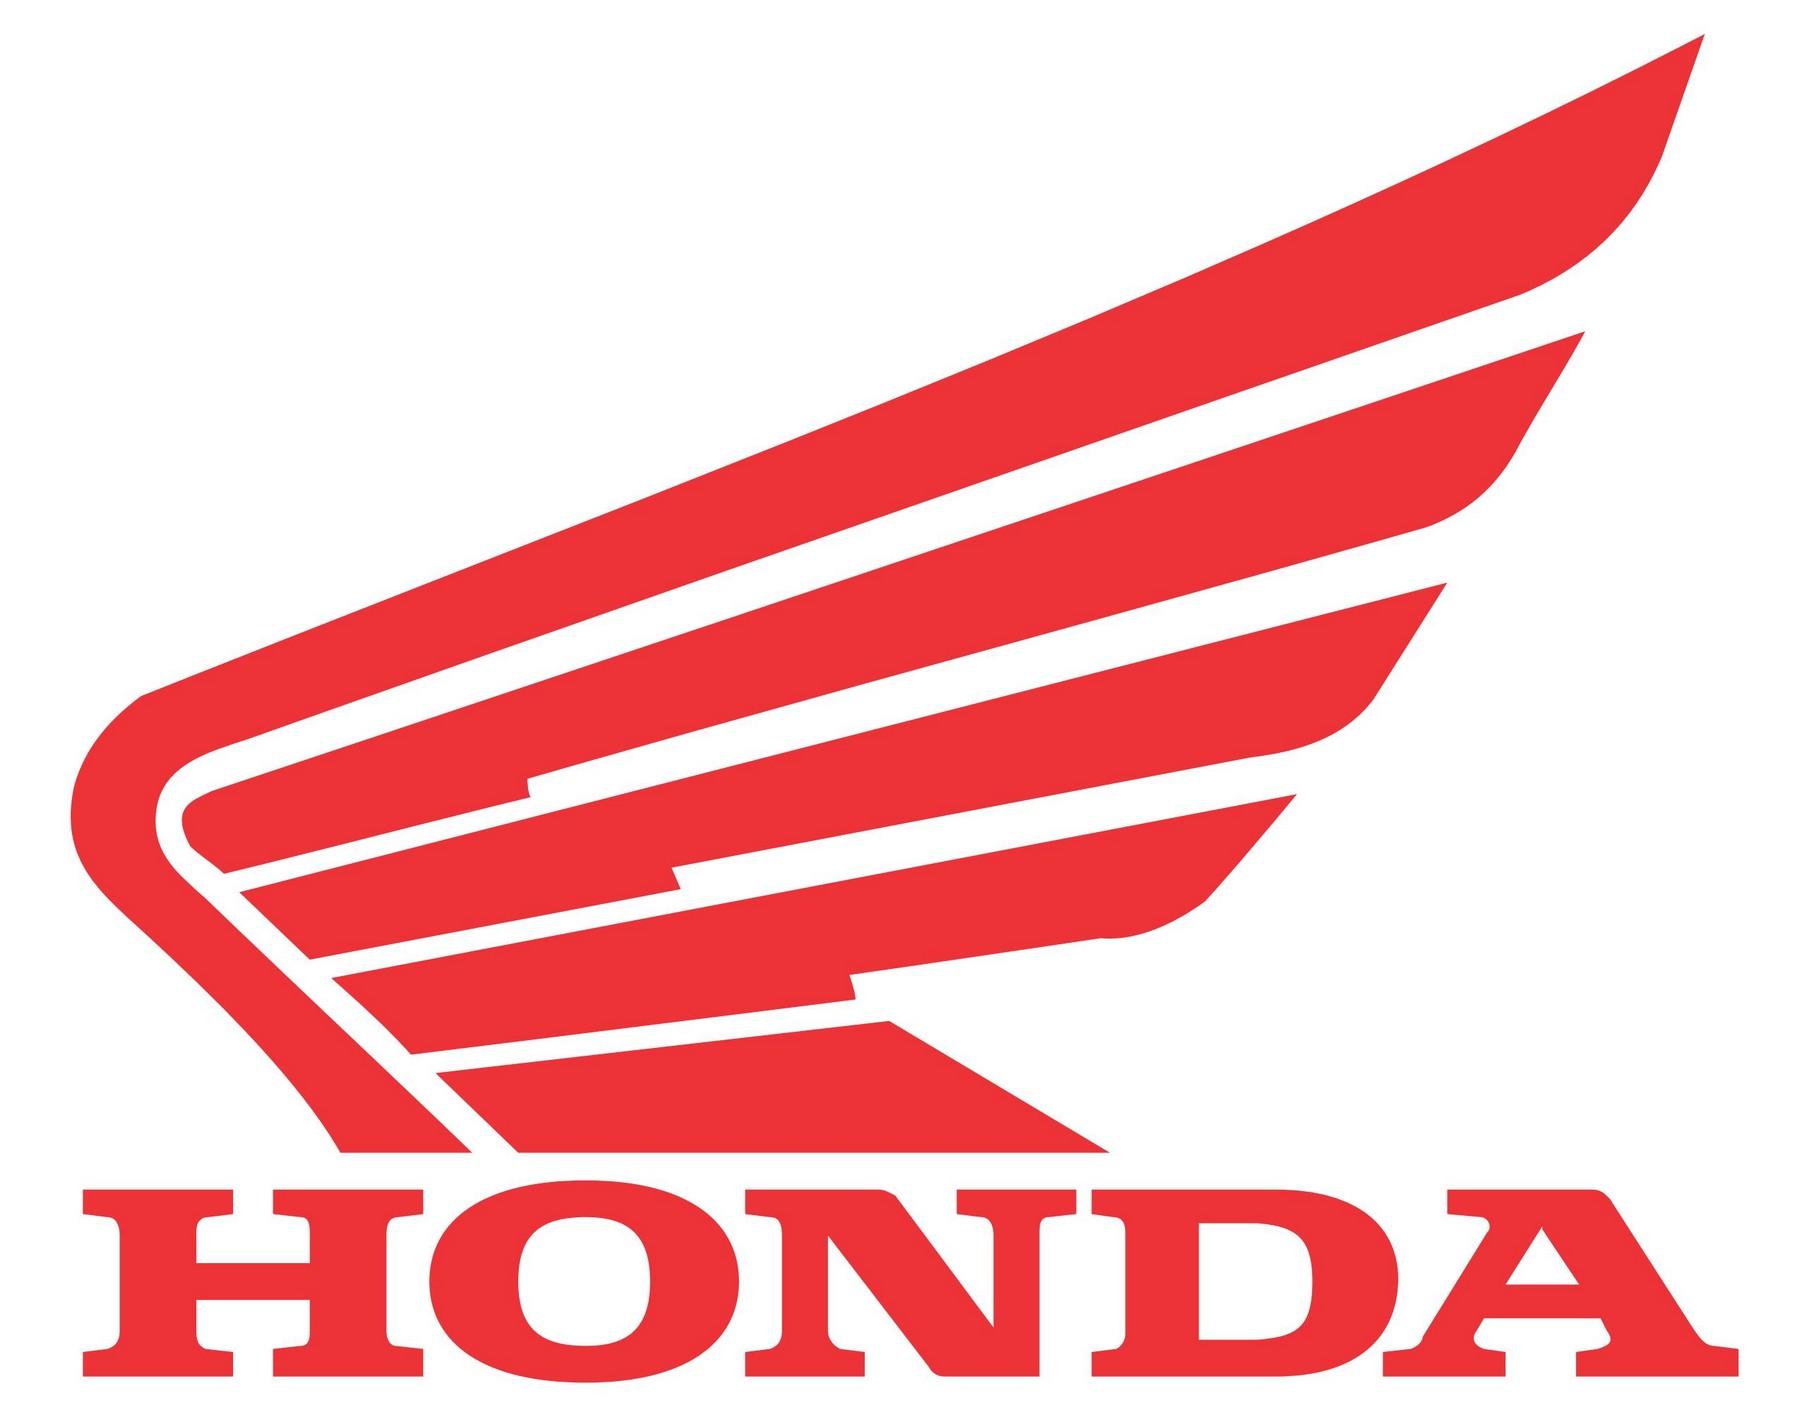 Motorcycle clipart honda motorcycle Motorcycle logo on PDF] Best